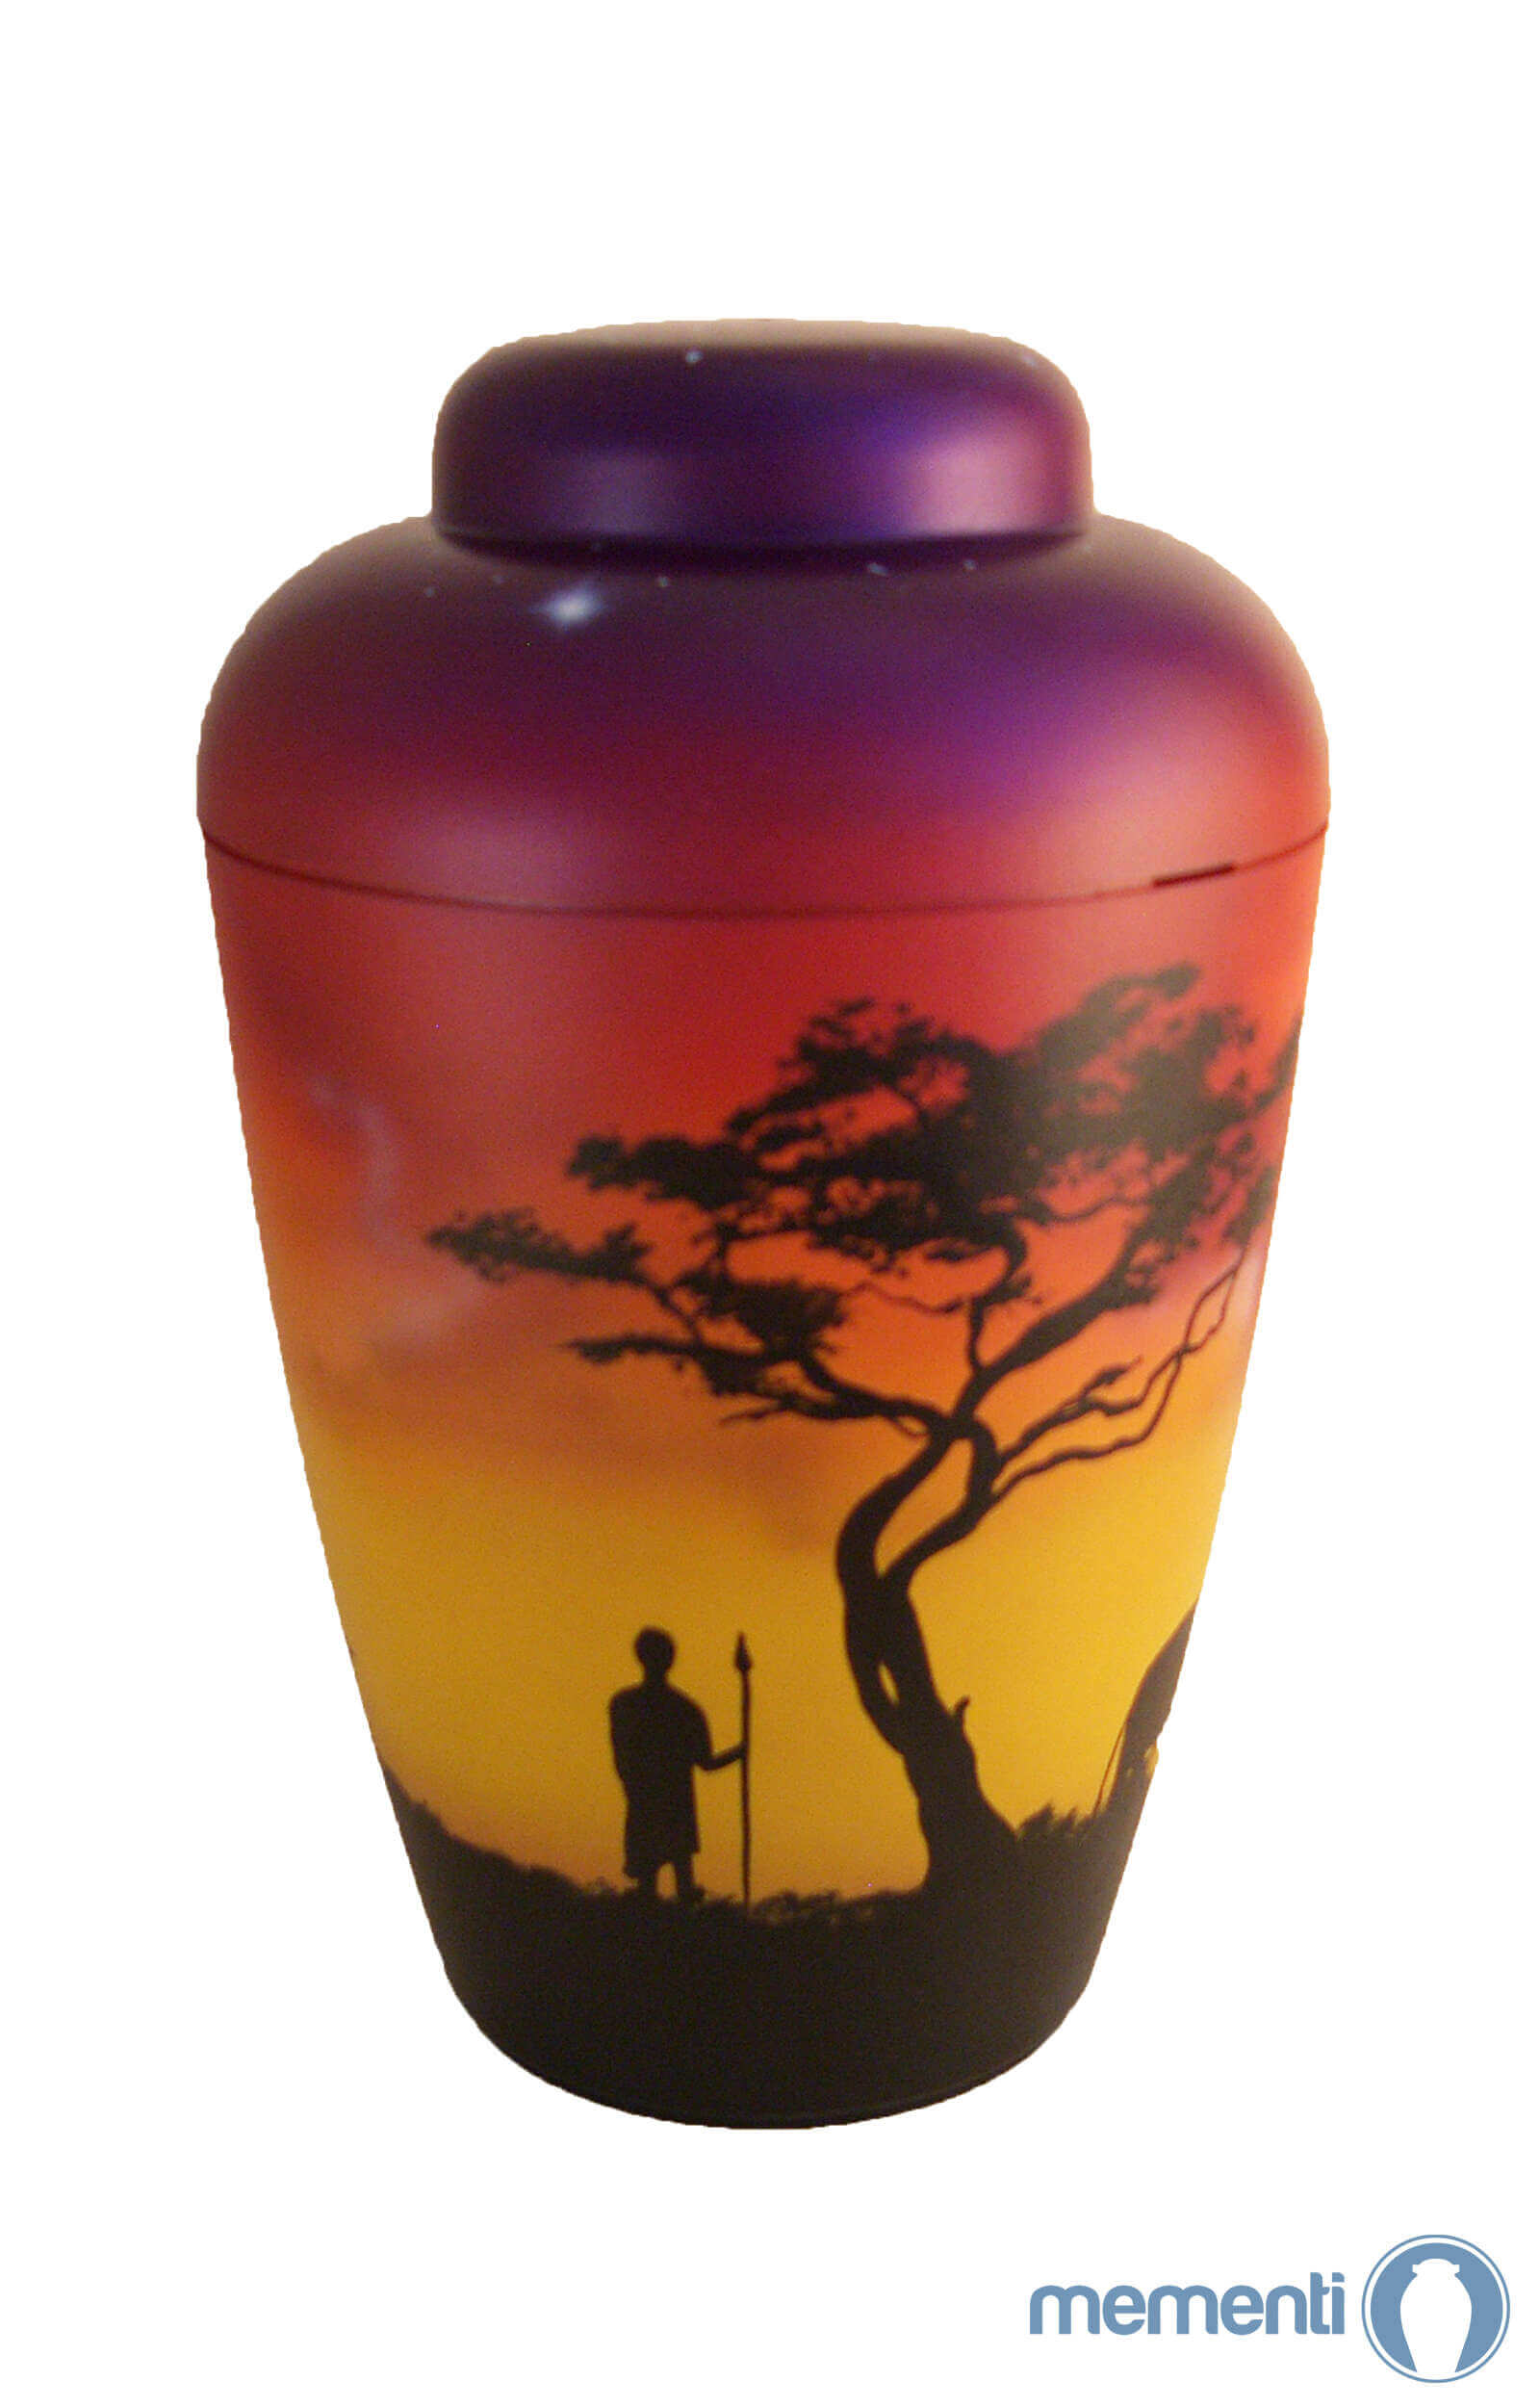 de BAA1303 afrika urne savanne